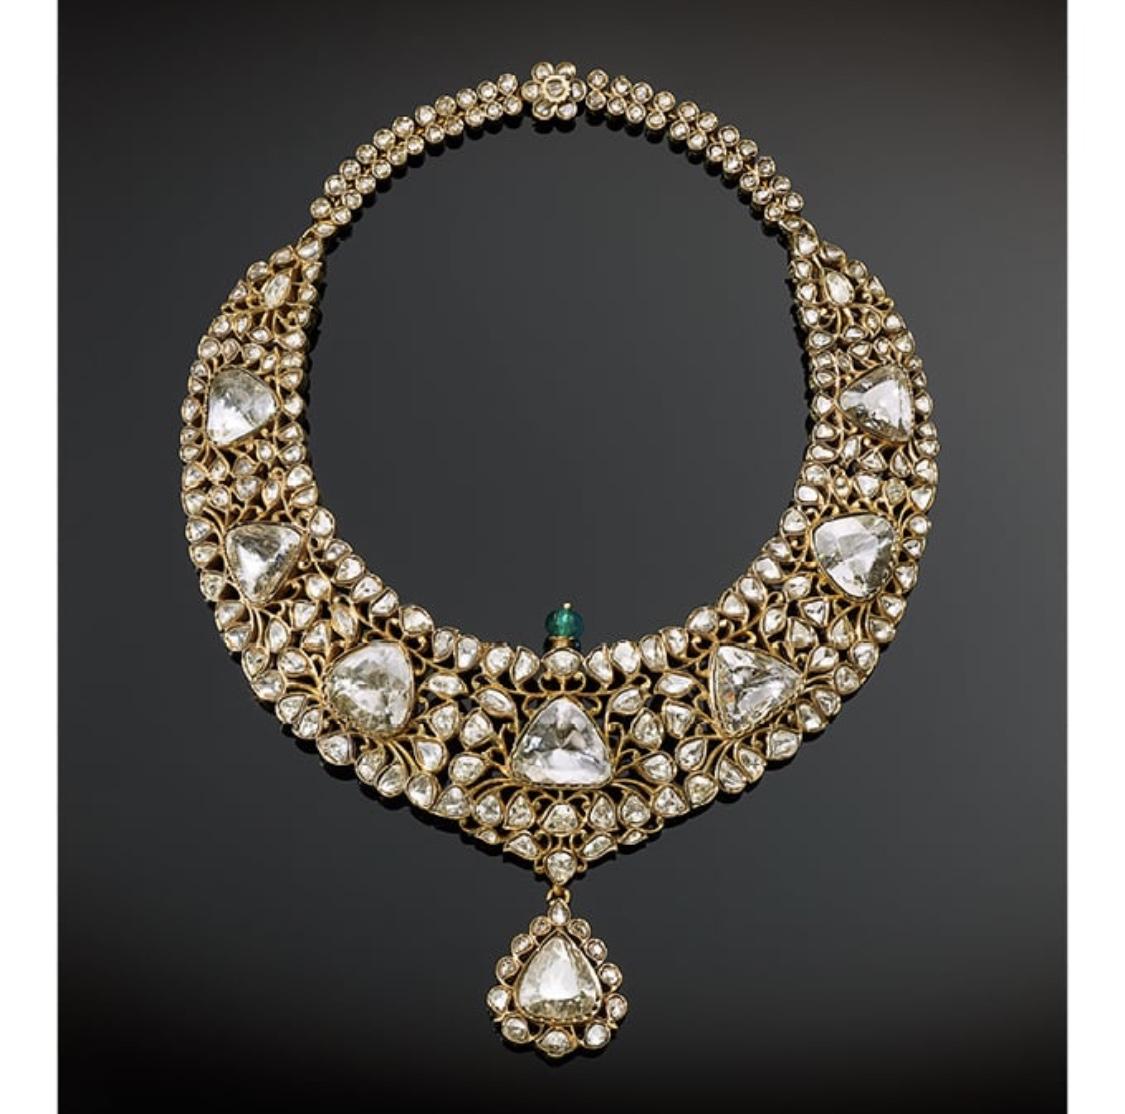 Nizam of Hyderabad Necklace.  Photo source: christies.com